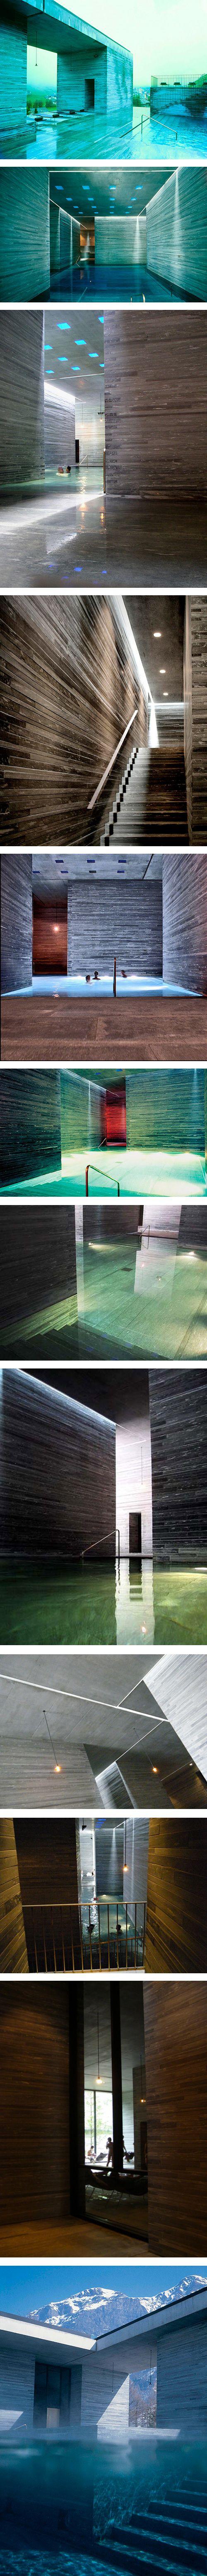 Hot Springs in Vals (Switzerland) by Pritzker Award Winner 2009 Peter Zumthor.